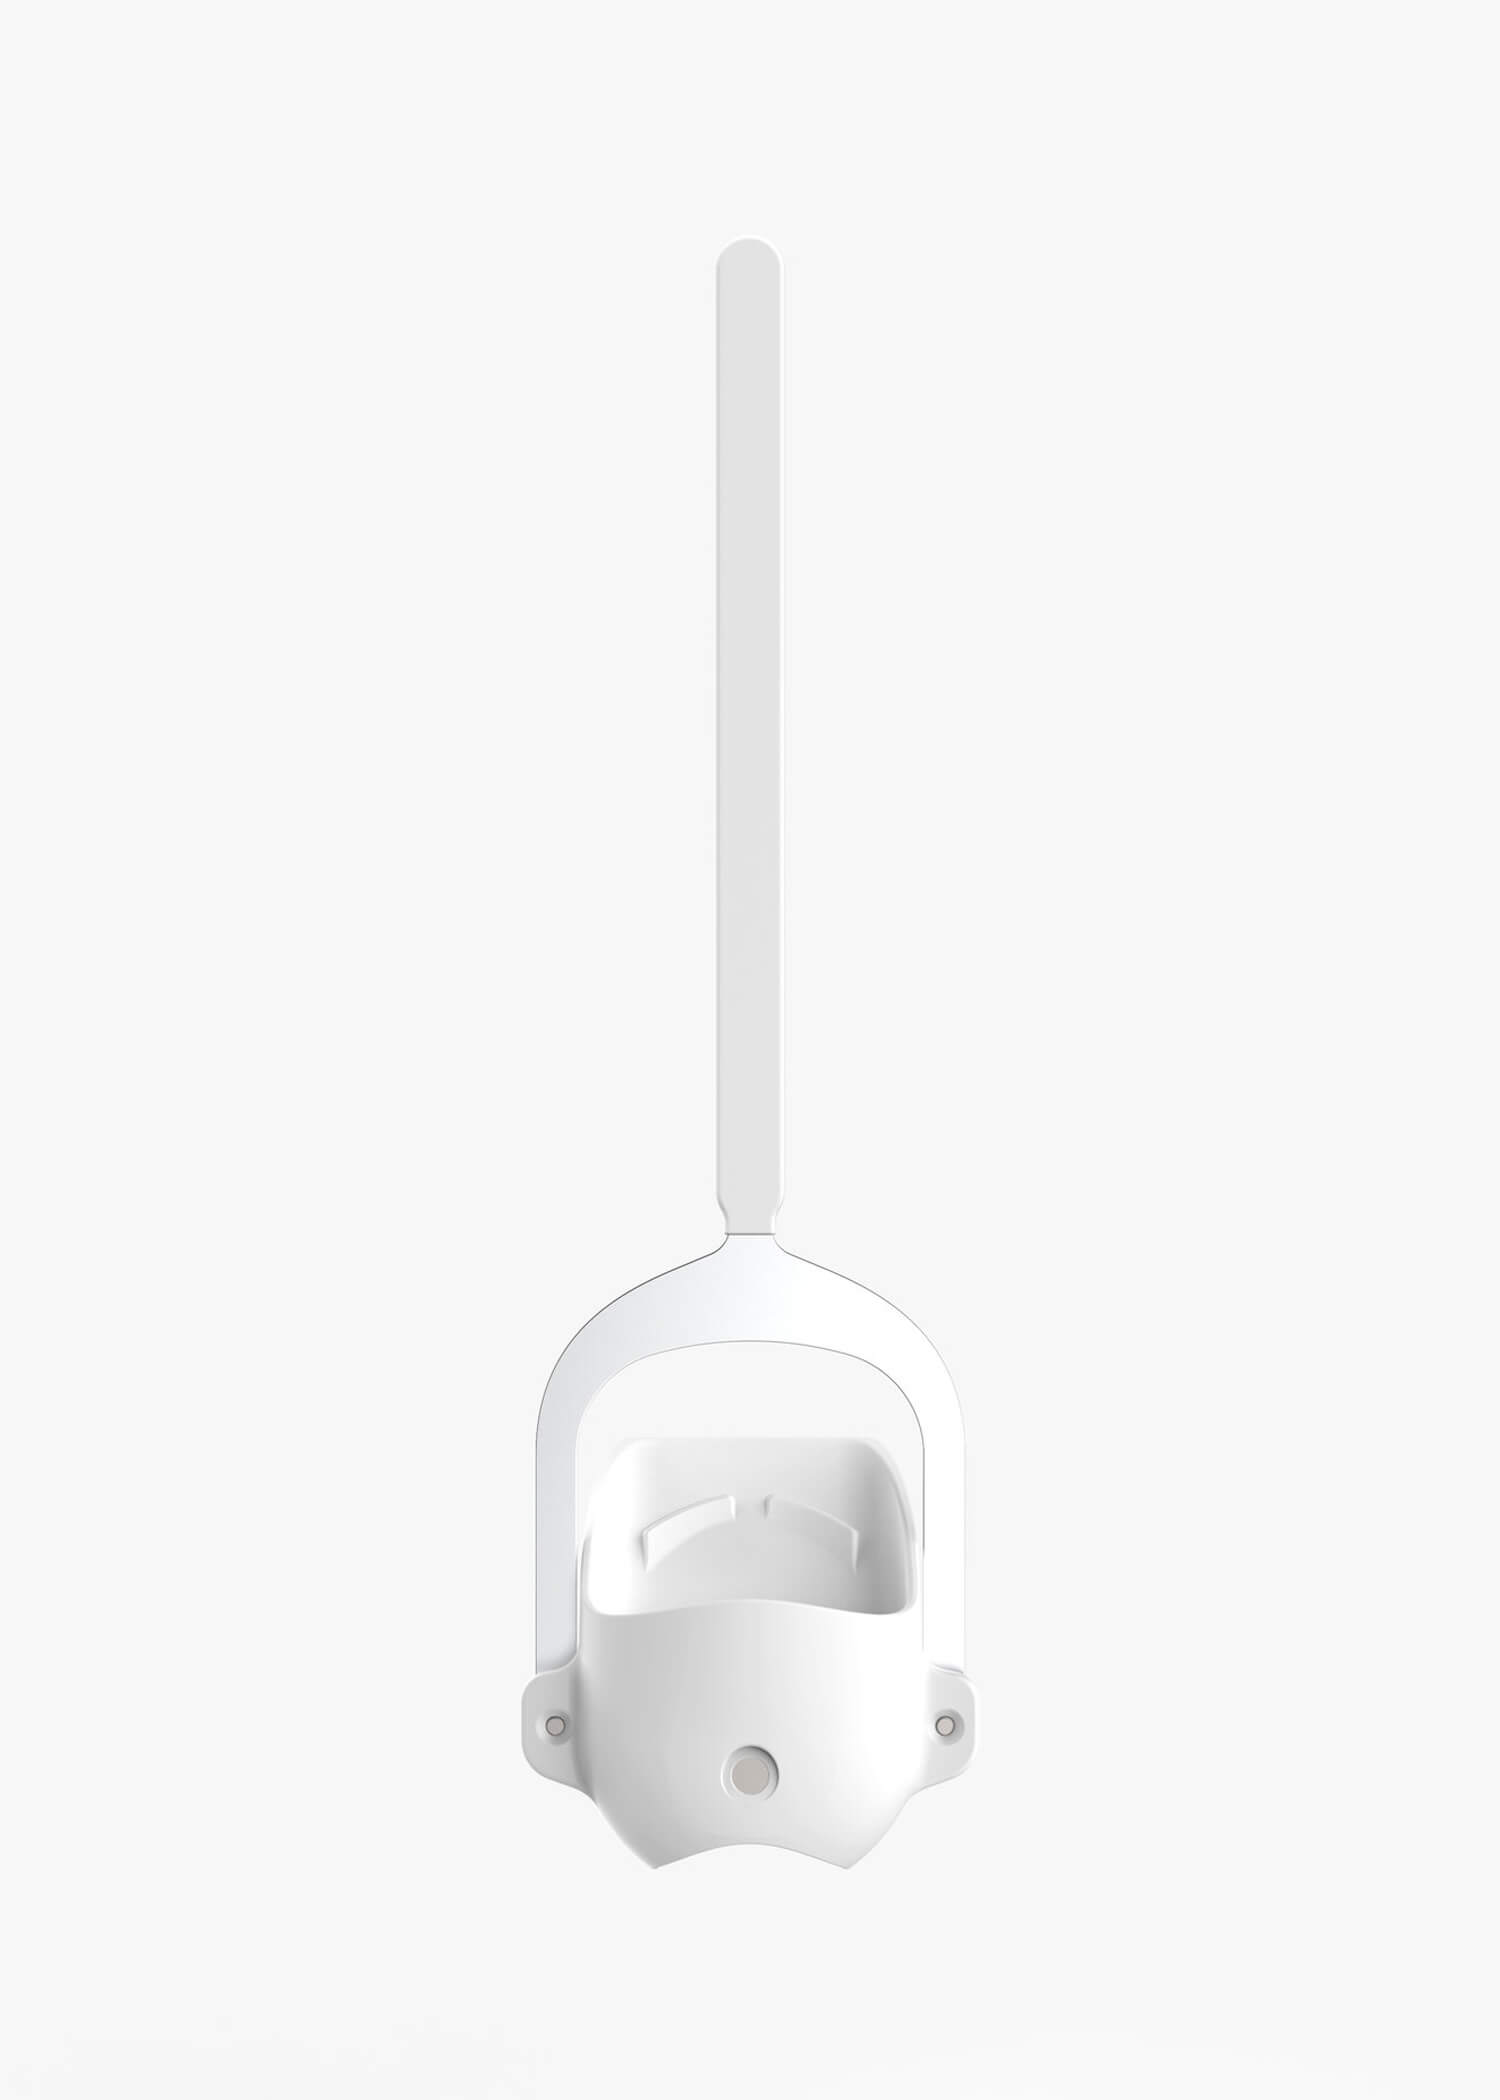 Flushbrush product design cradle holder brush head